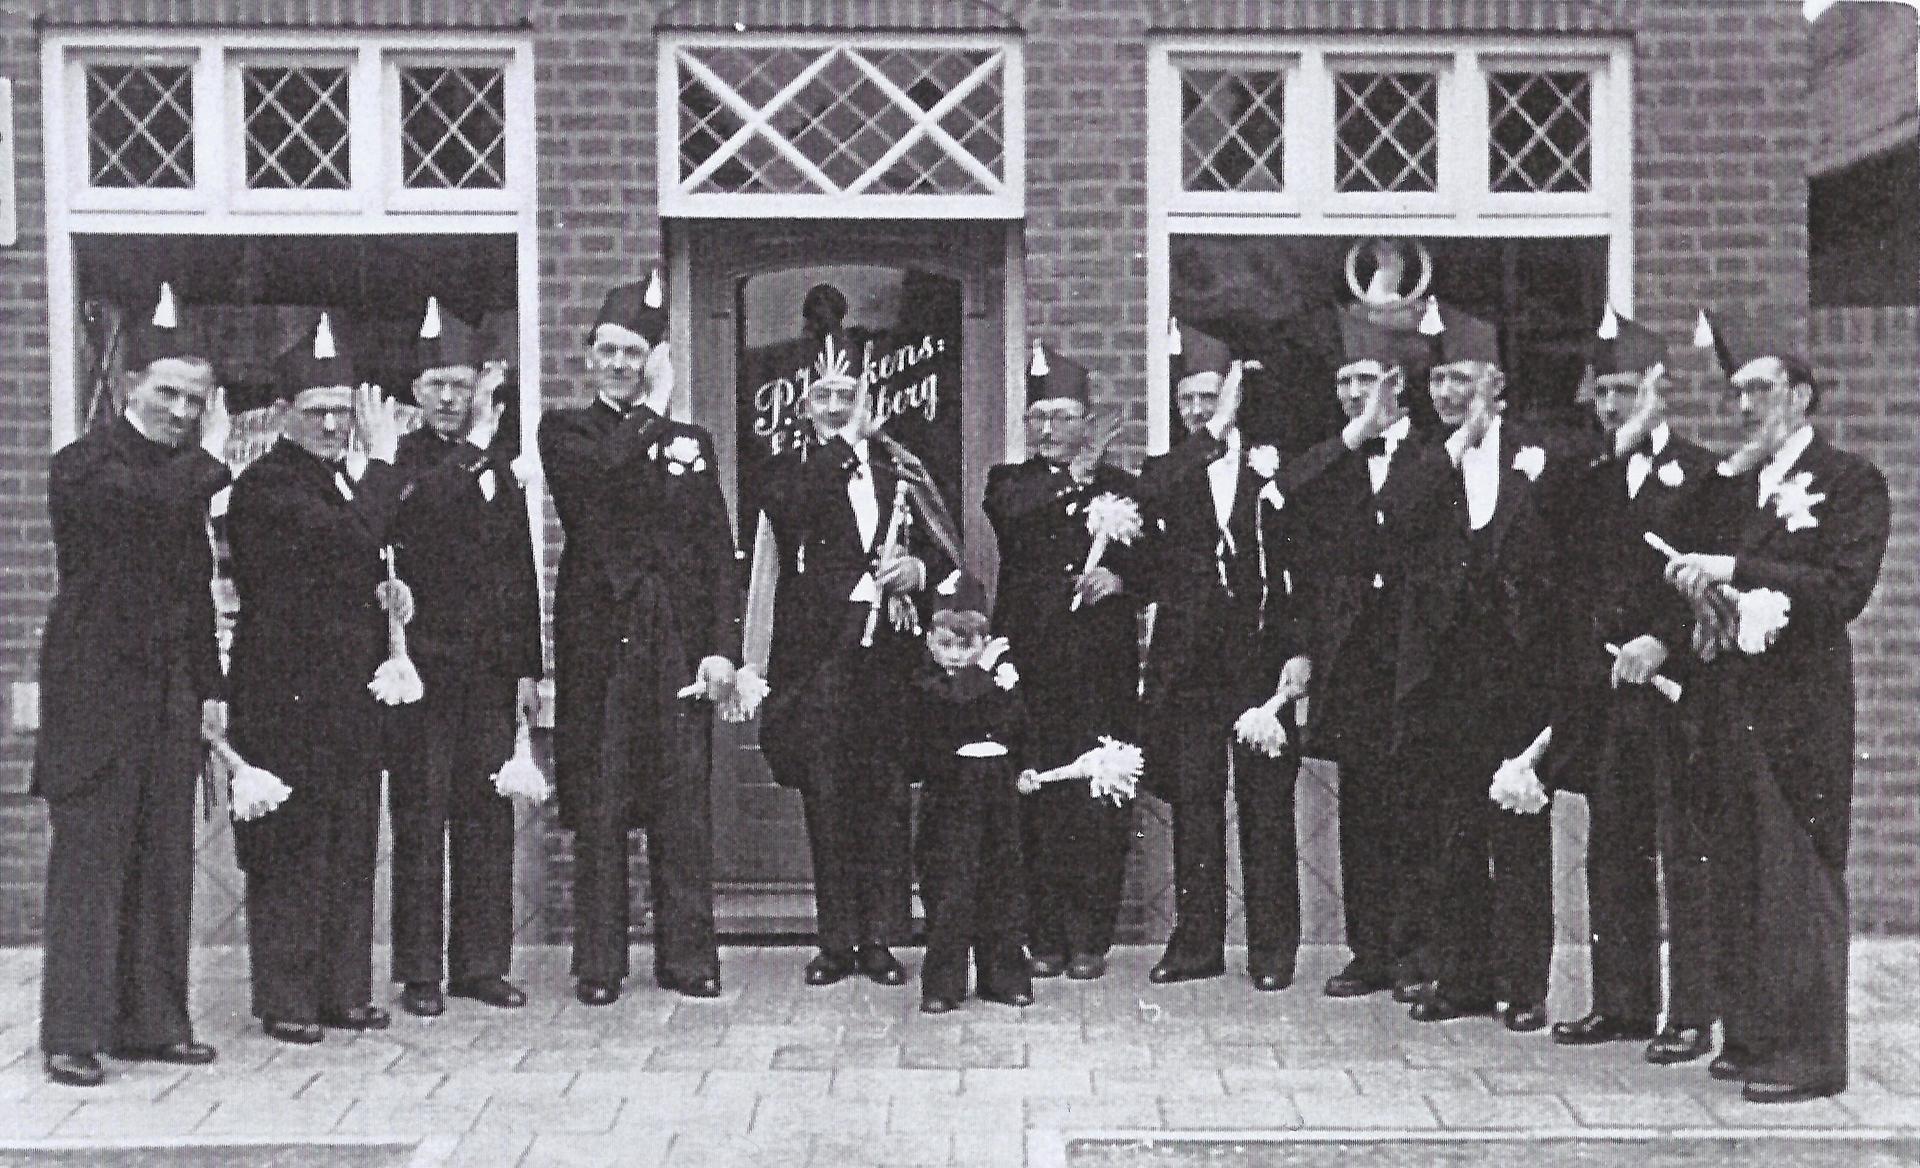 jaren 50 groepsfoto CV D'n Doal 1920x1168